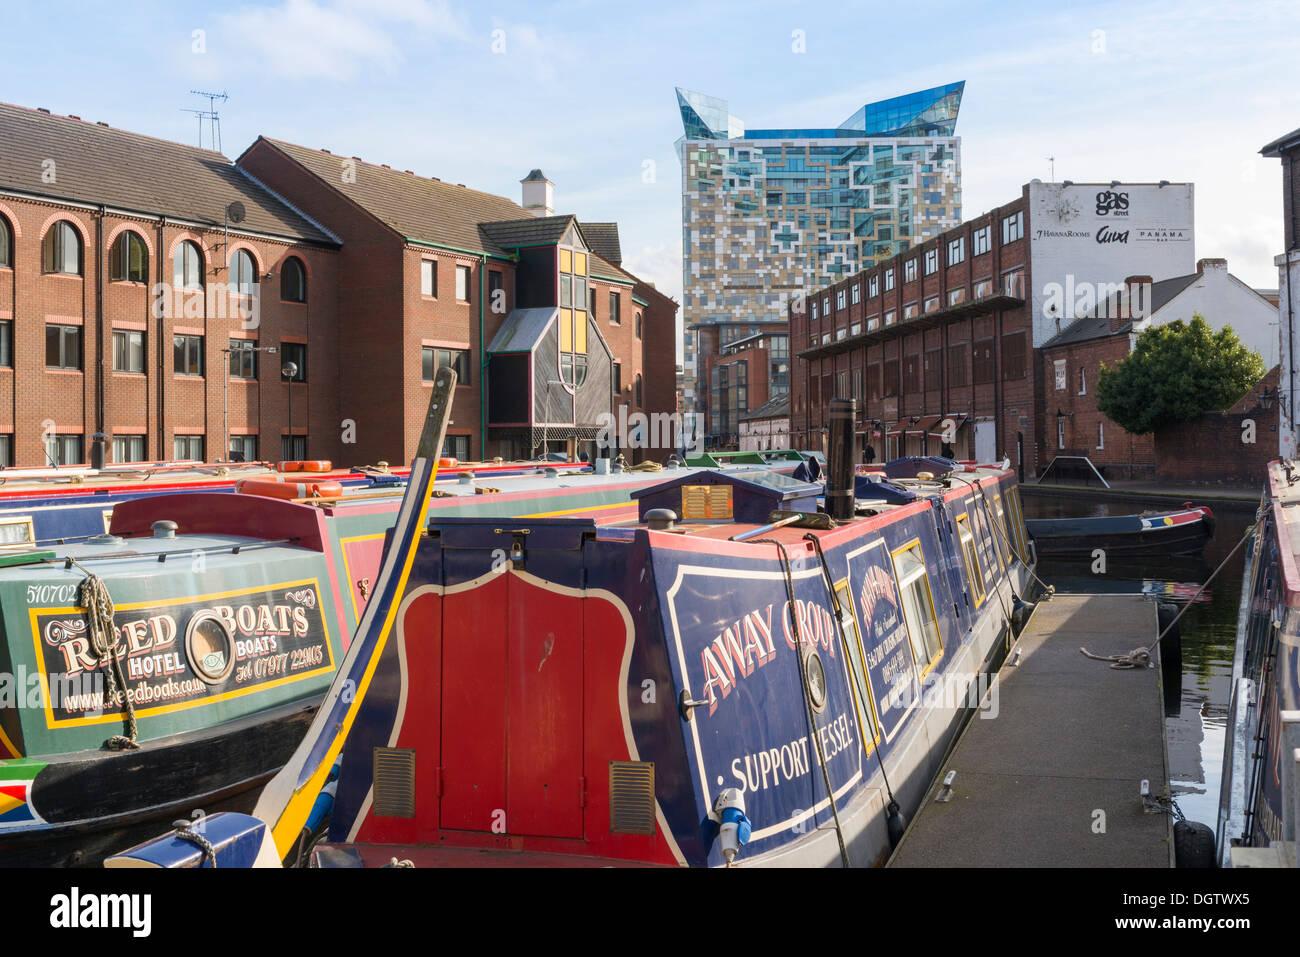 Gas Street Basin canal, Birmingham, West Midlands, England, UK - Stock Image